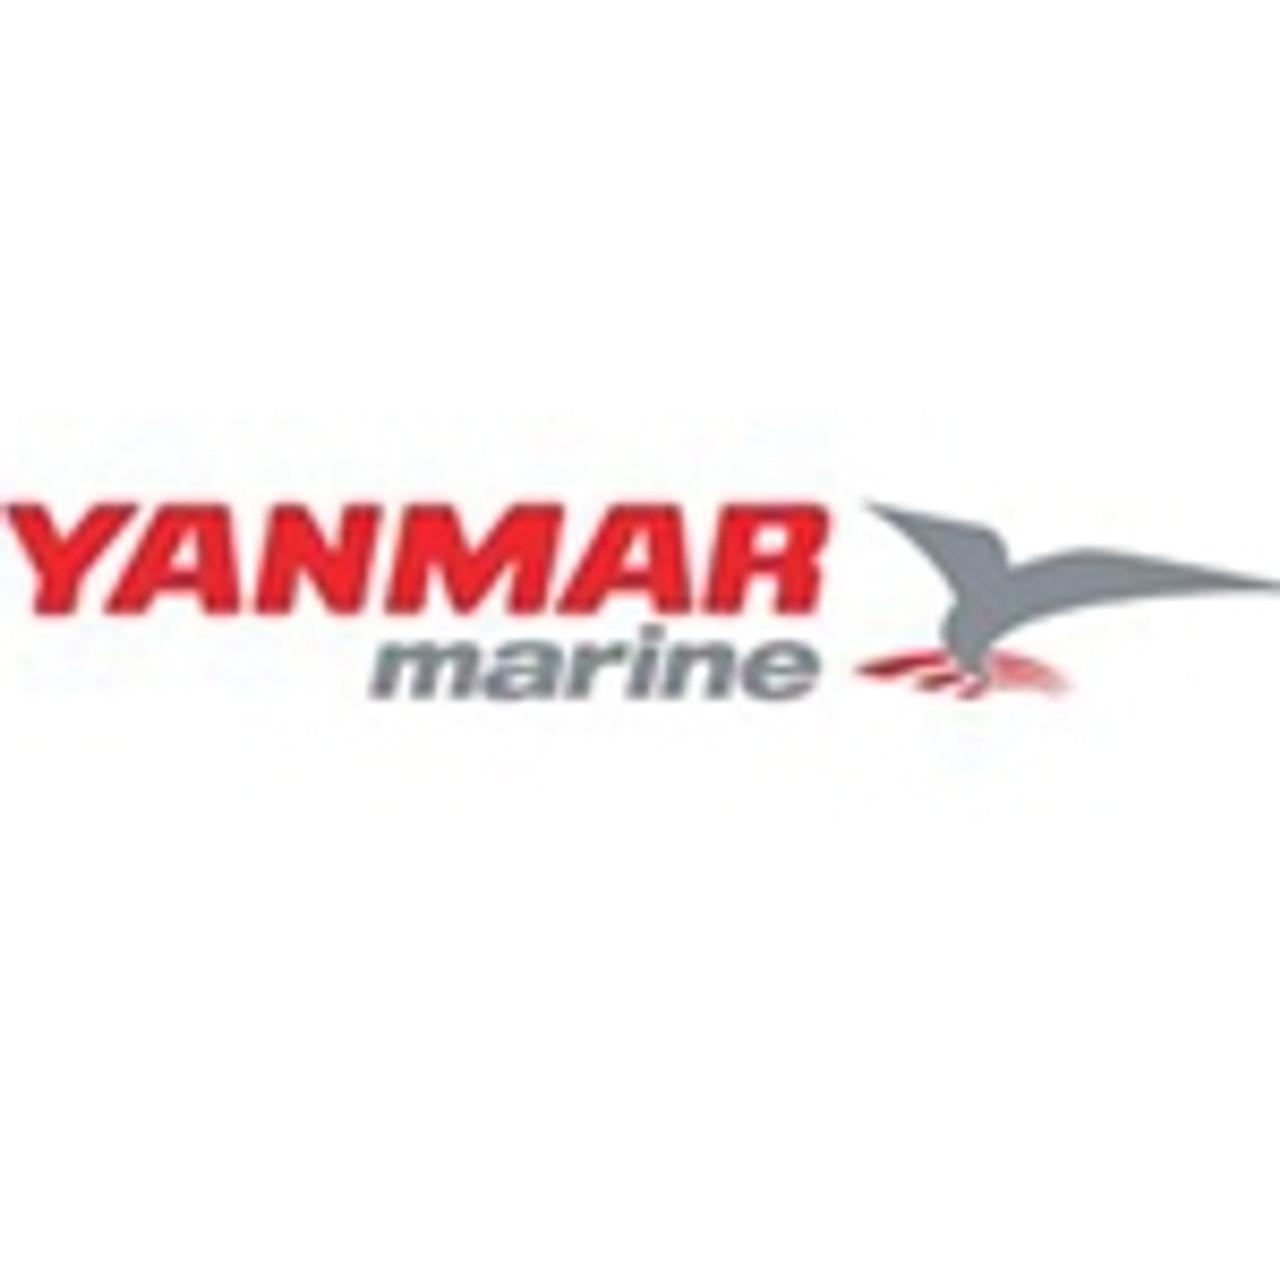 Yanmar Marine